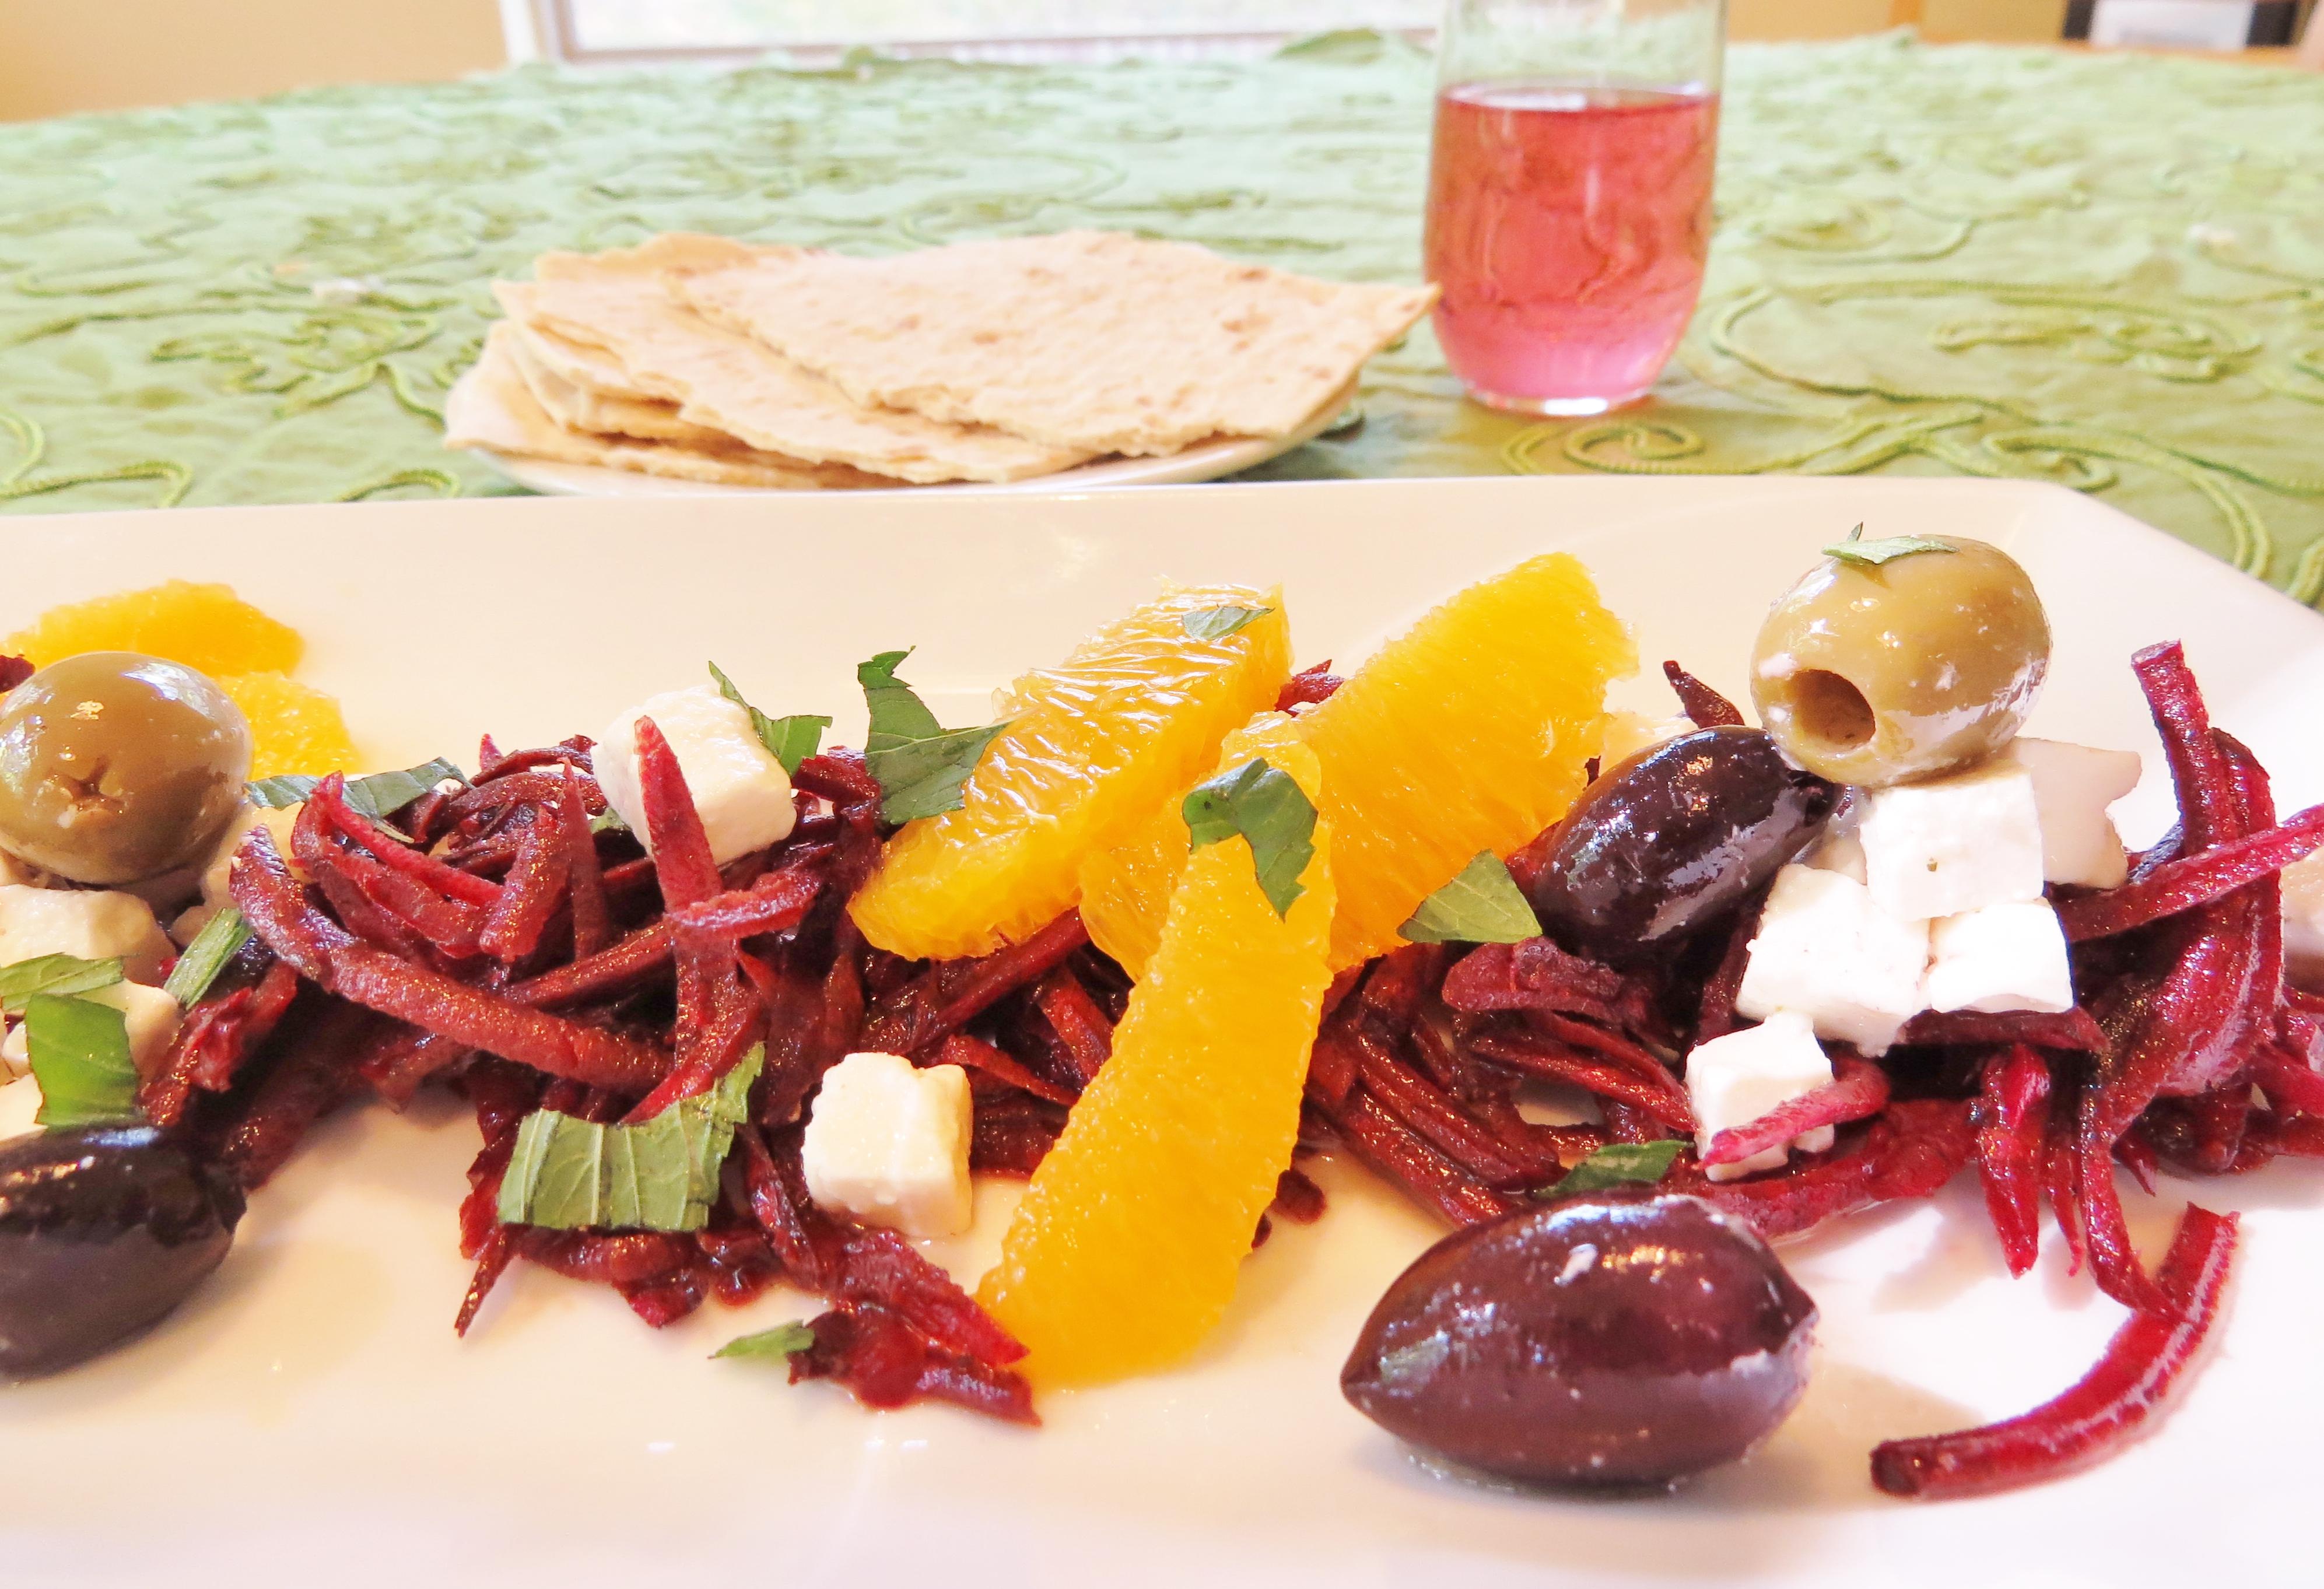 marinated beet salad with juicy fresh orange segments, cured olives ...